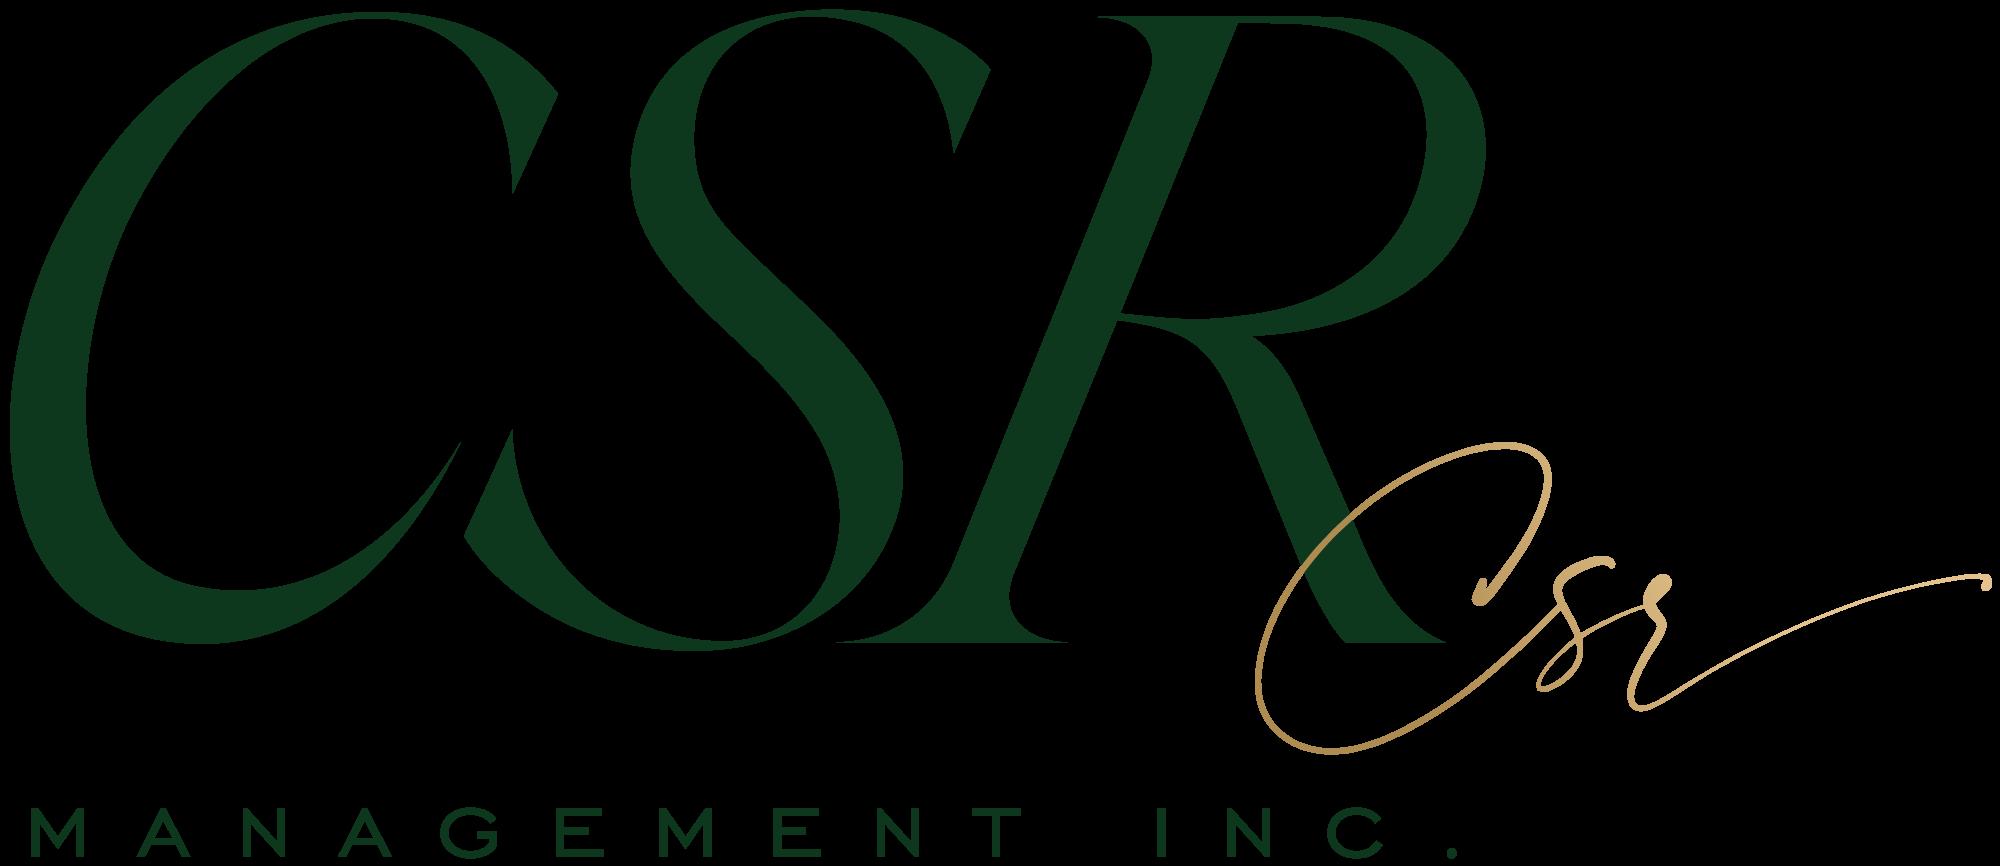 CSR Management Inc